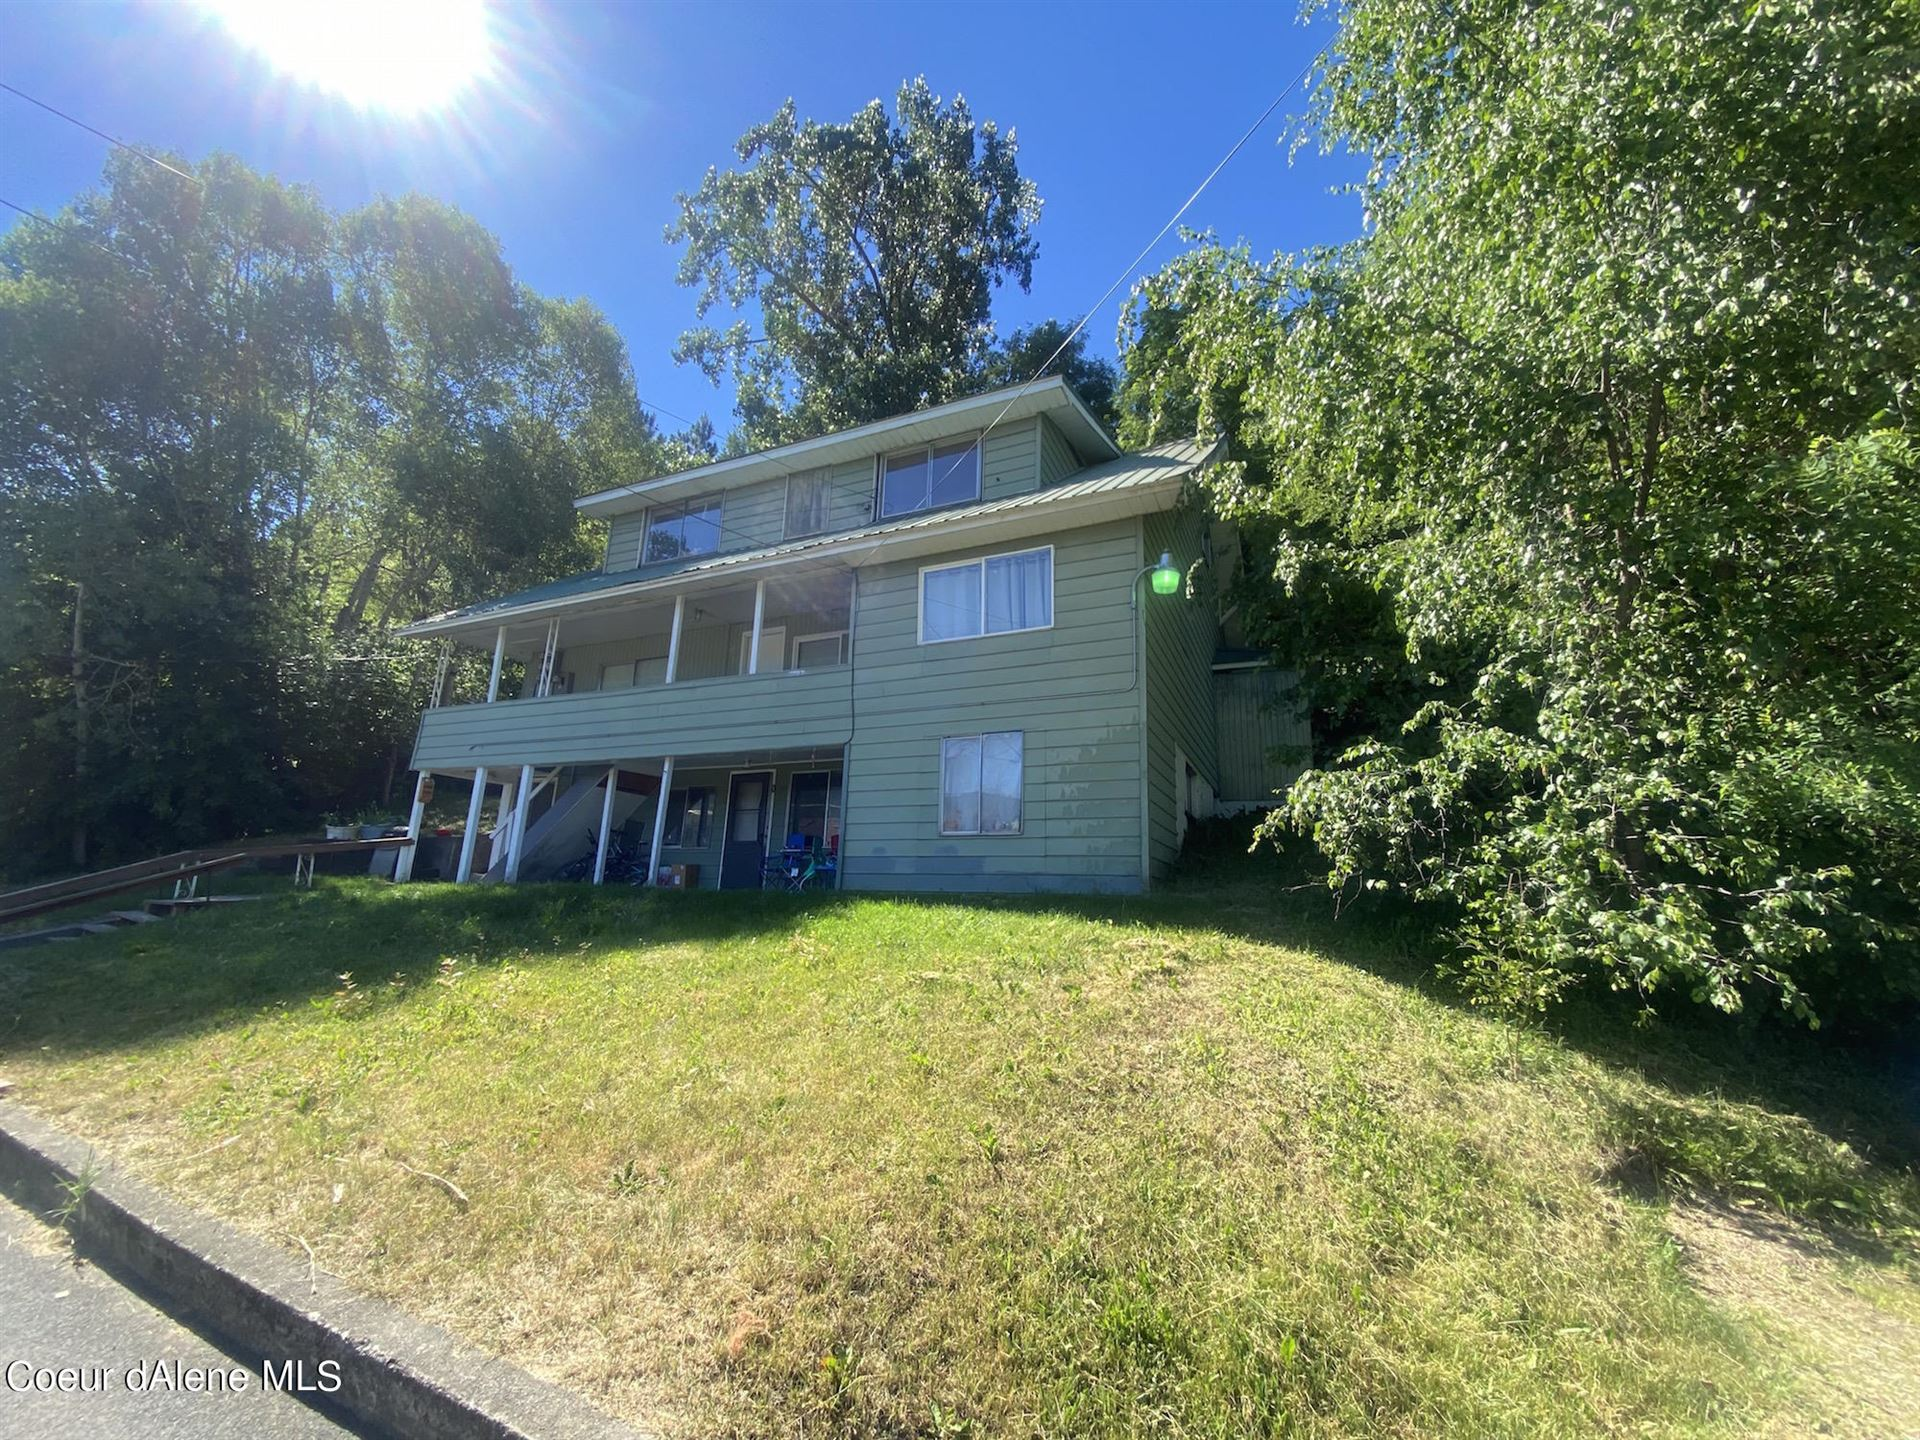 Photo of 401 W Portland Ave, Kellogg, ID 83837 (MLS # 21-7352)